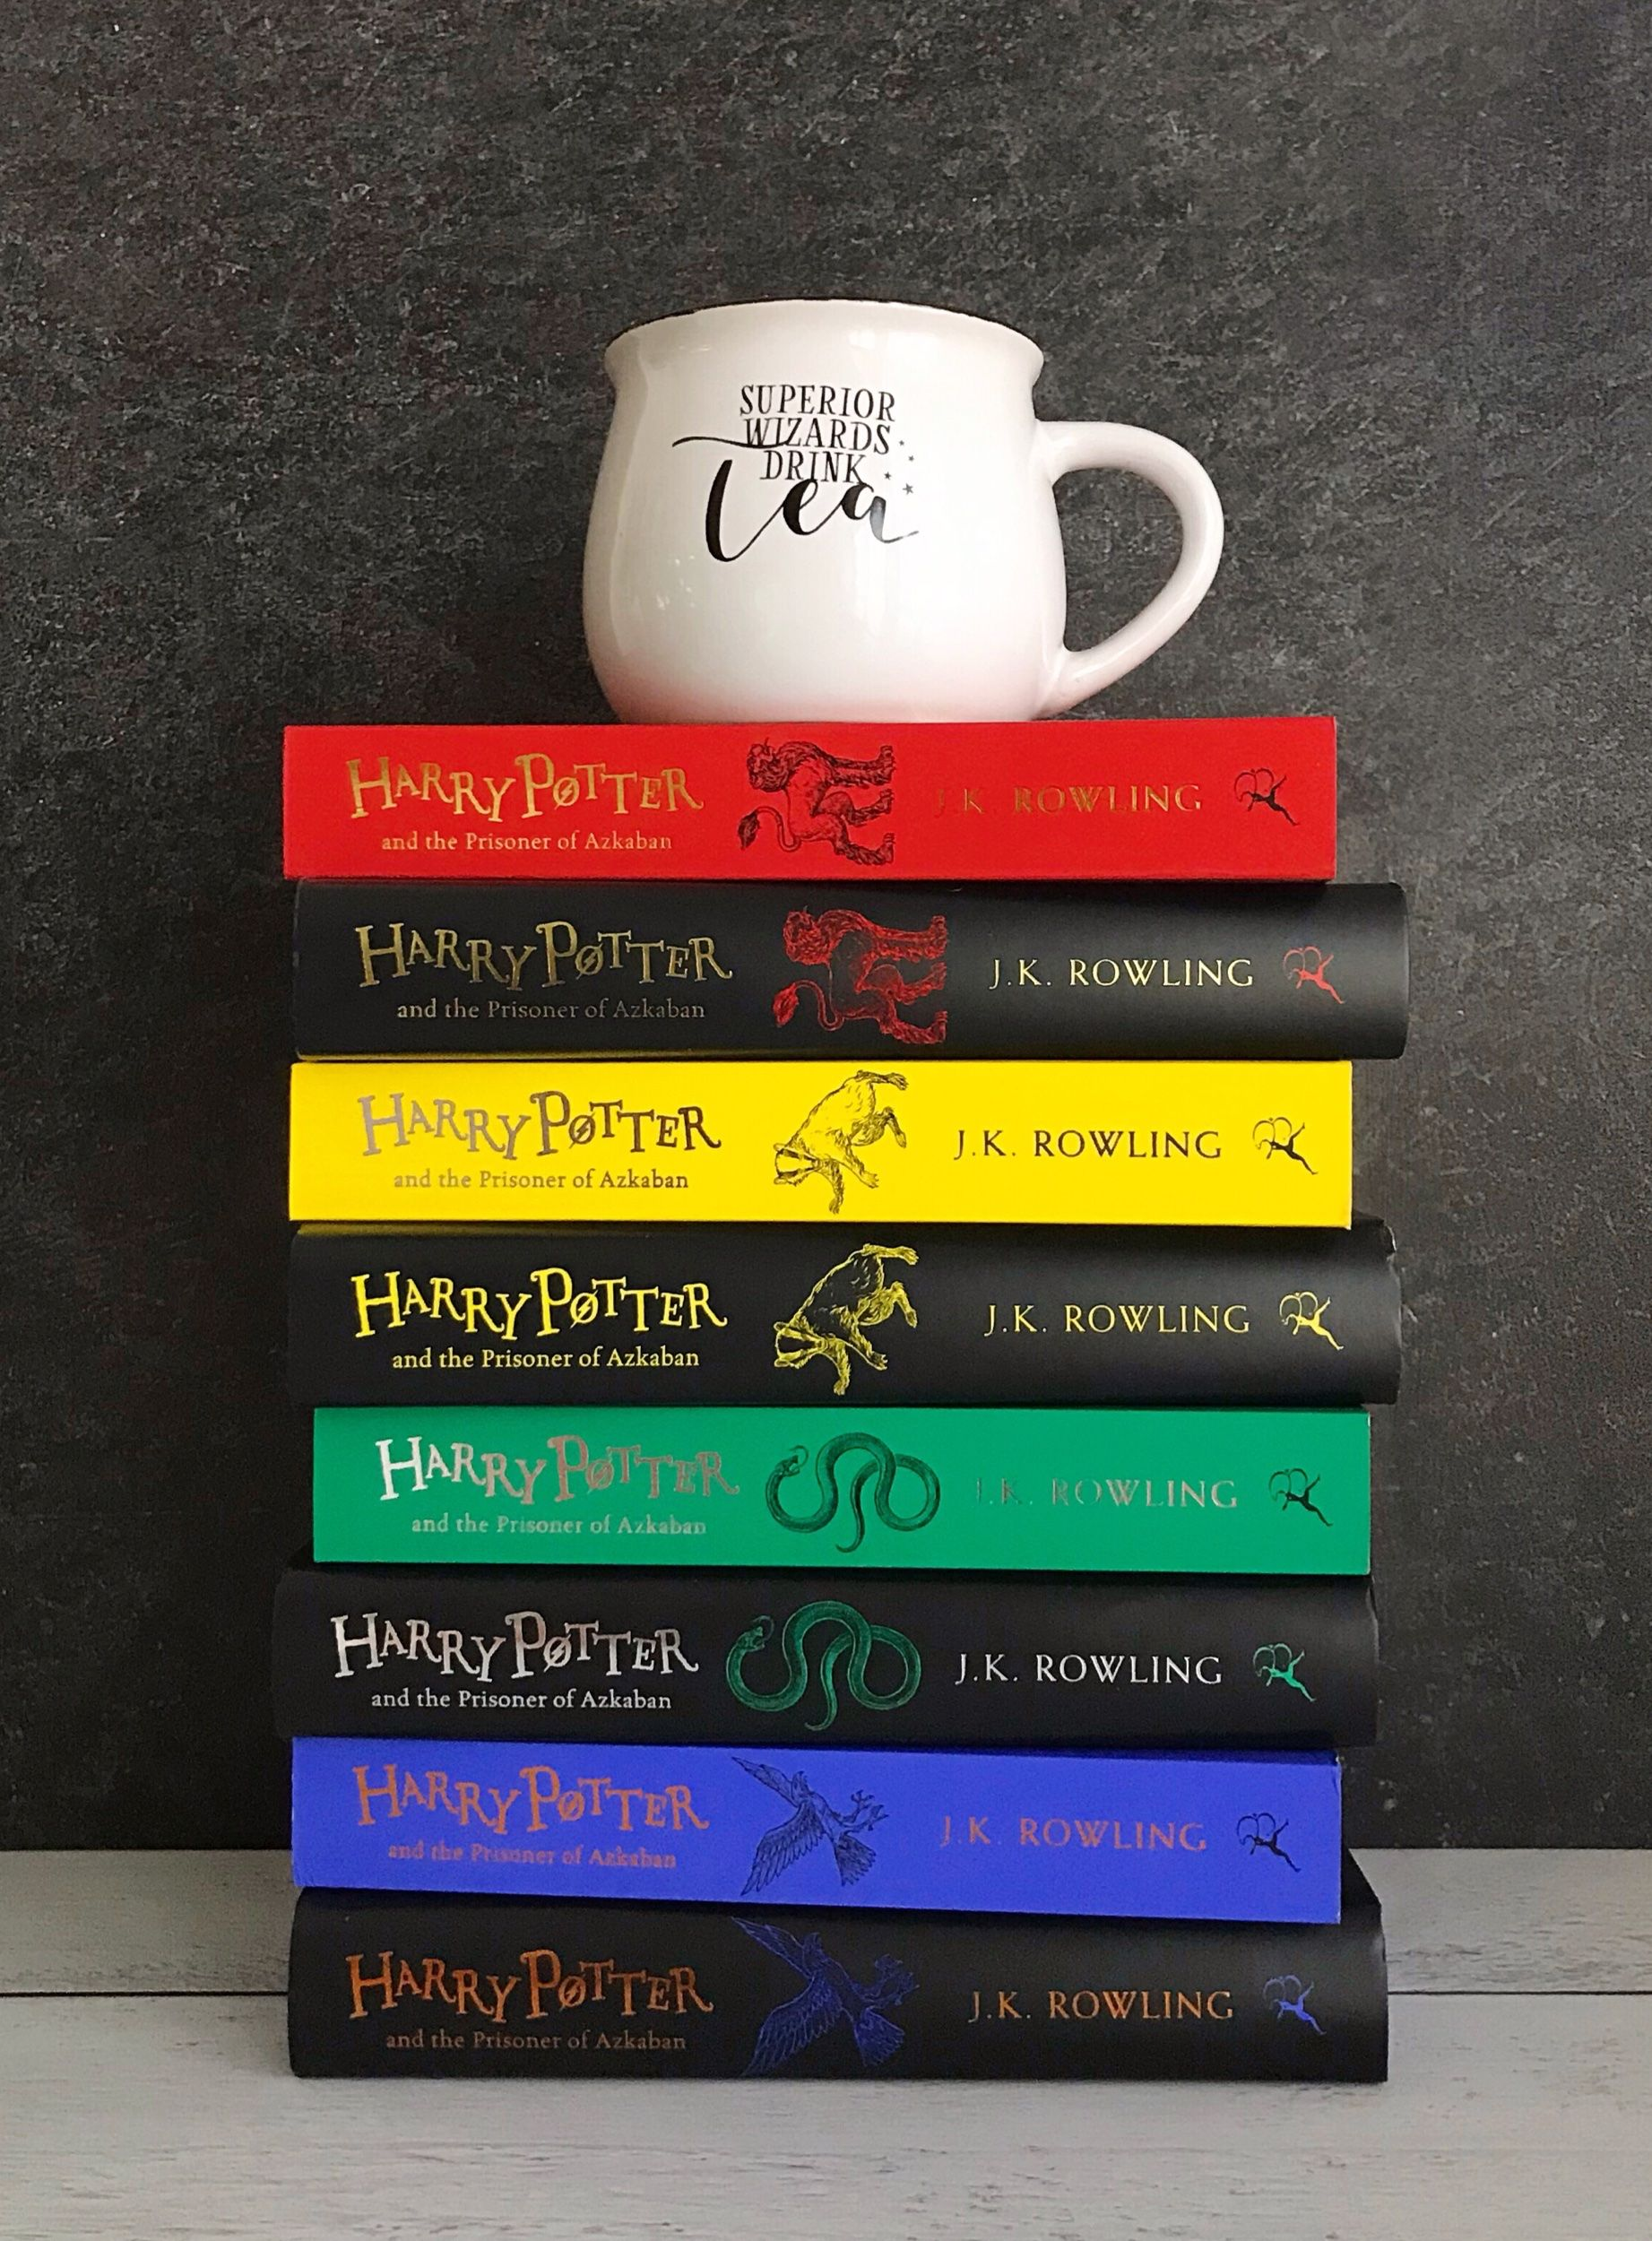 Harry Potter Edition 20 Ans : harry, potter, edition, Bloomsbury, Anniversary, Harry, Potter, Editions, Bluestocking, Bookshelf, Rowling,, Potter,, Livre